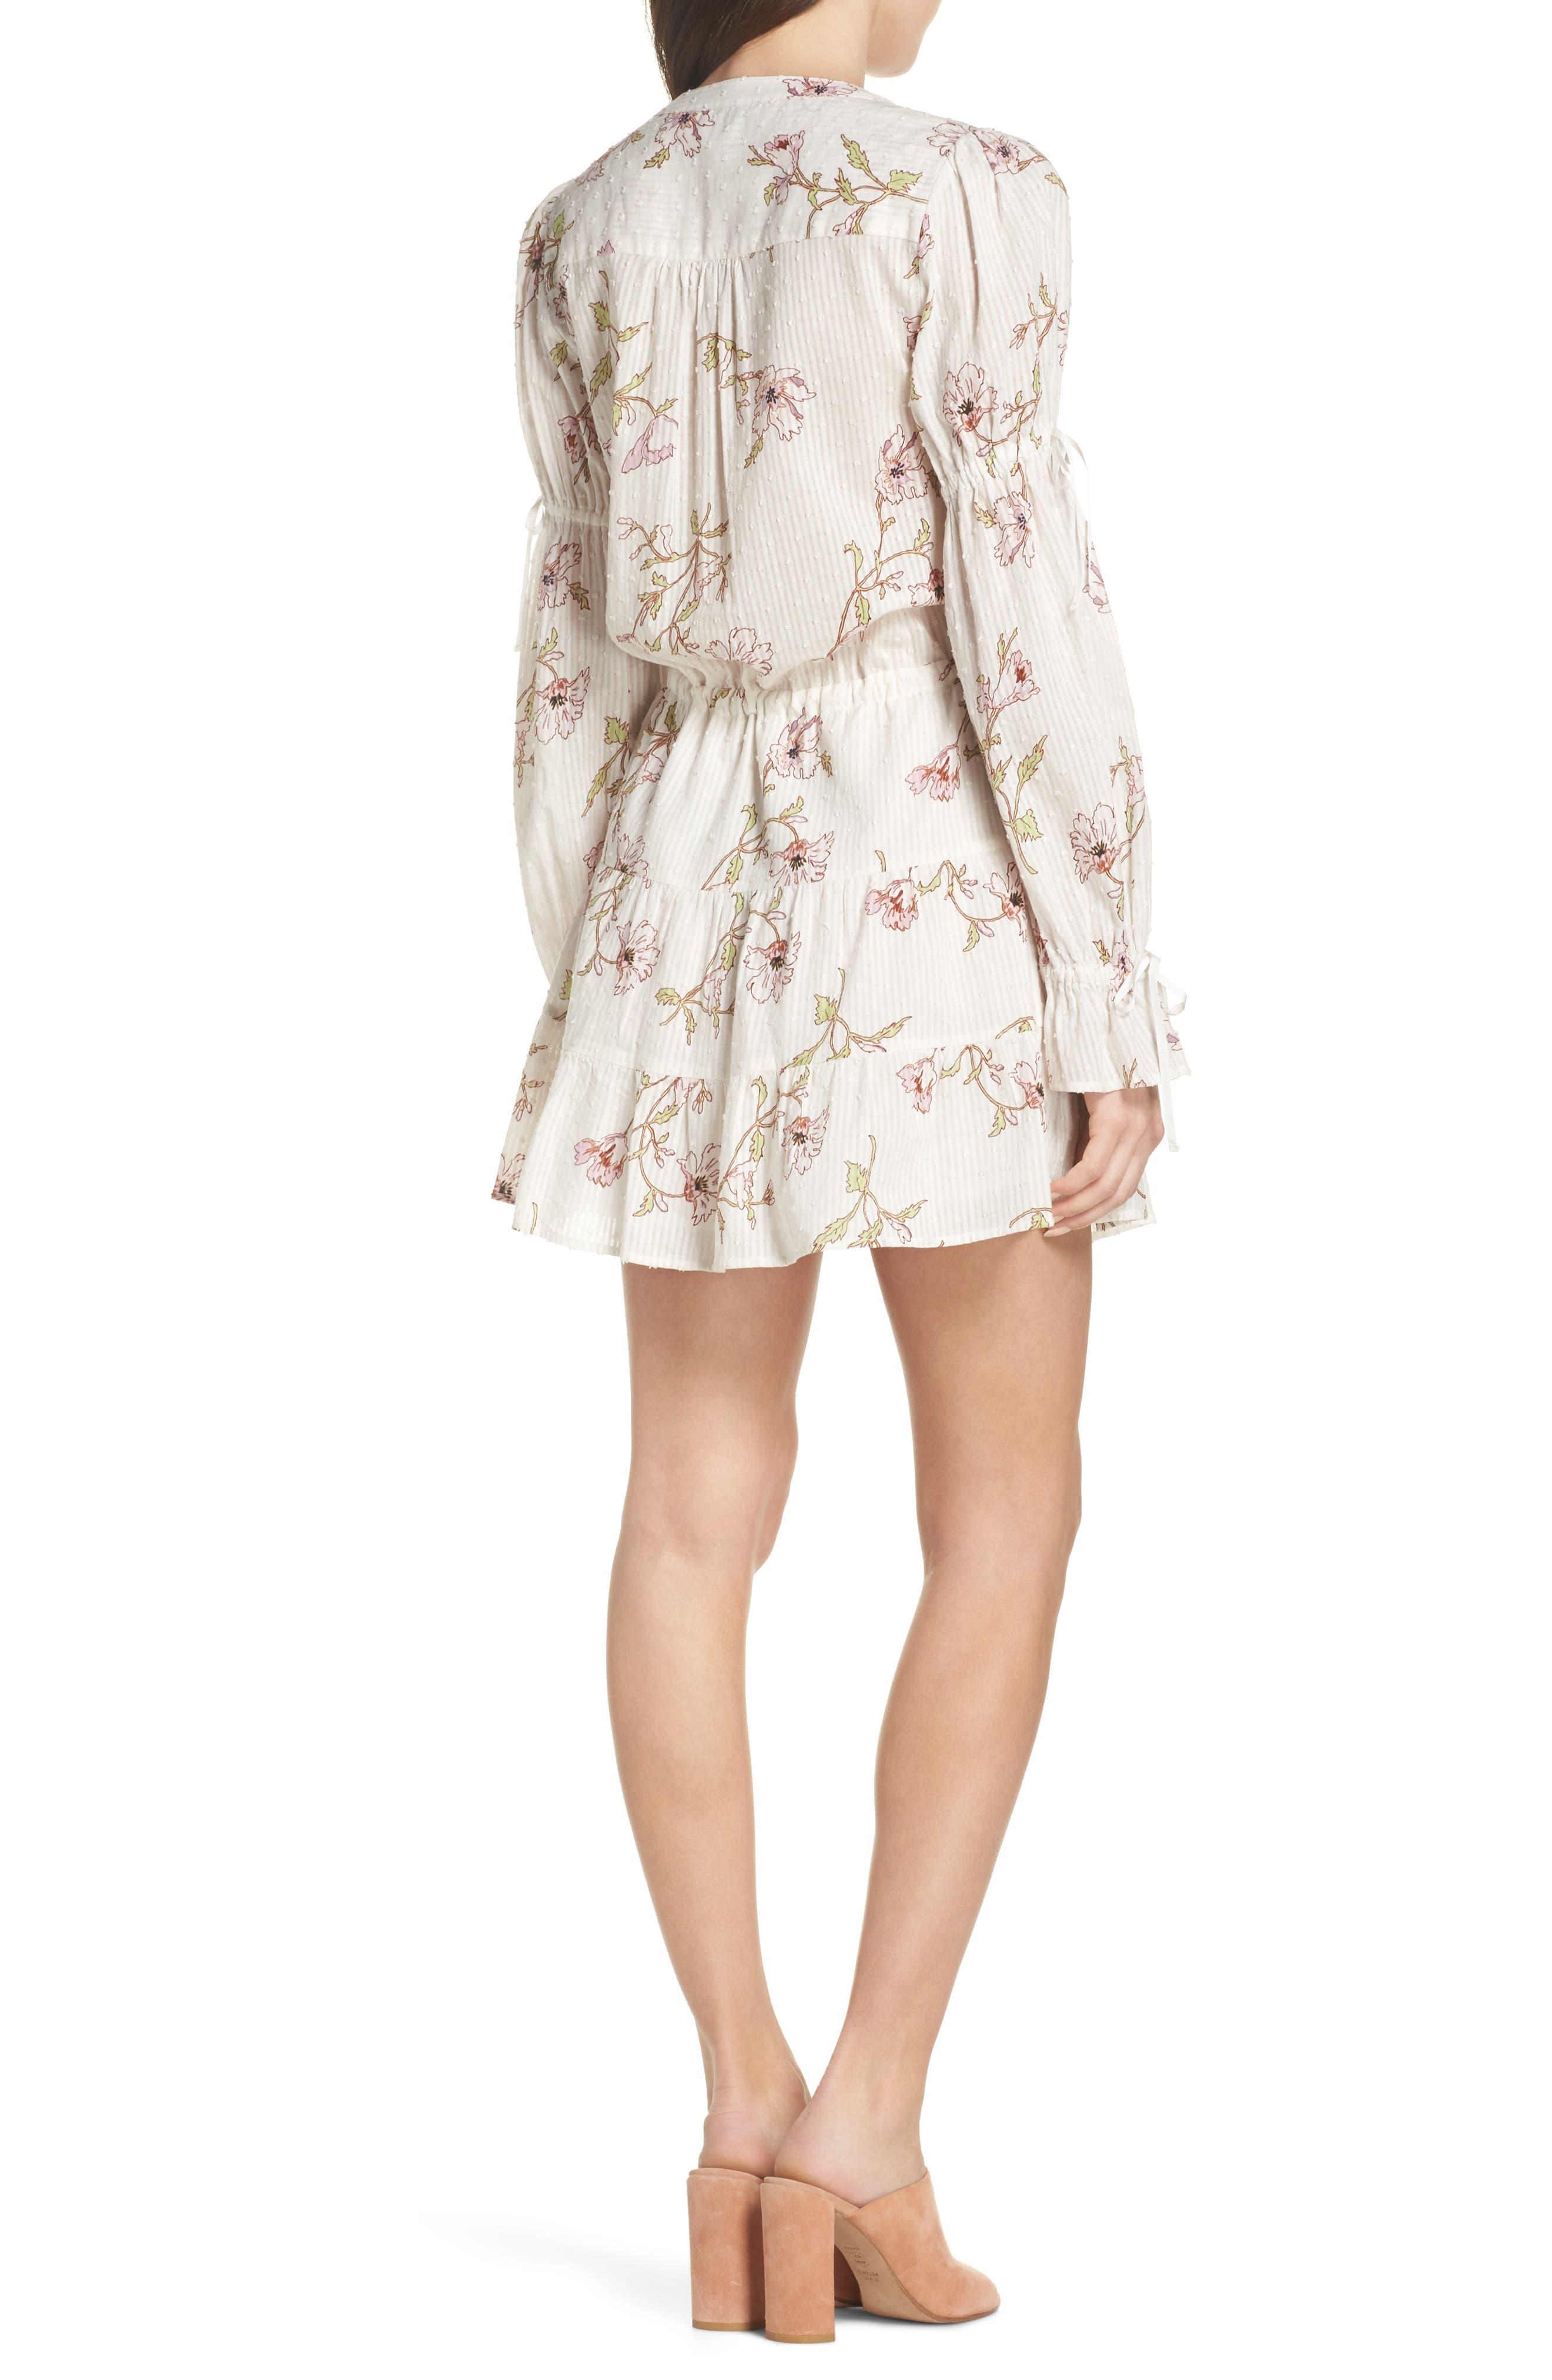 Yardley Floral Minidress,                             Alternate thumbnail 2, color,                             WHITE / MAUVE SHADOWS